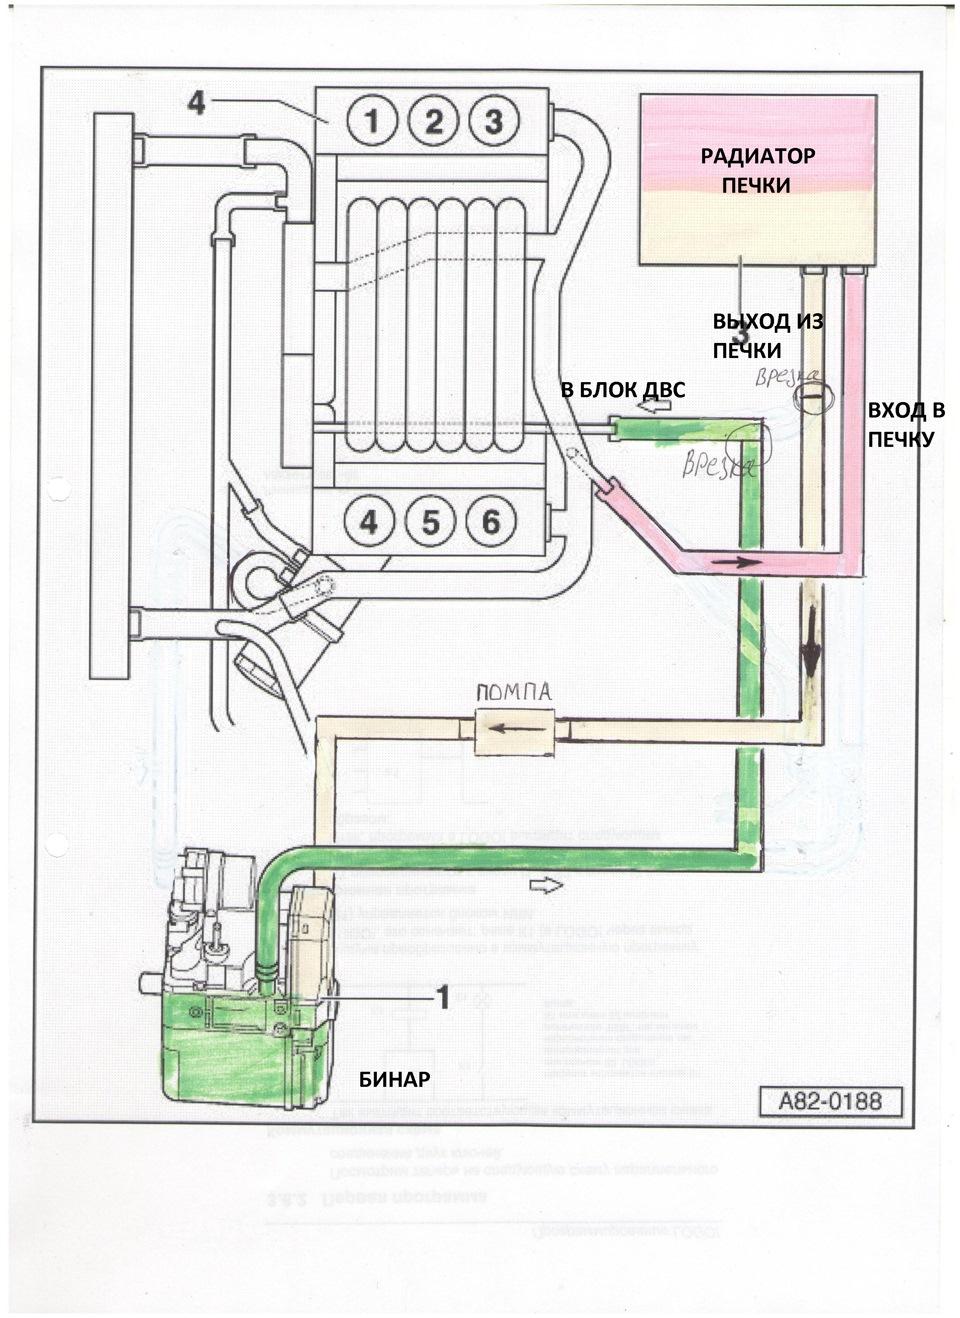 Схема установки бинар-5